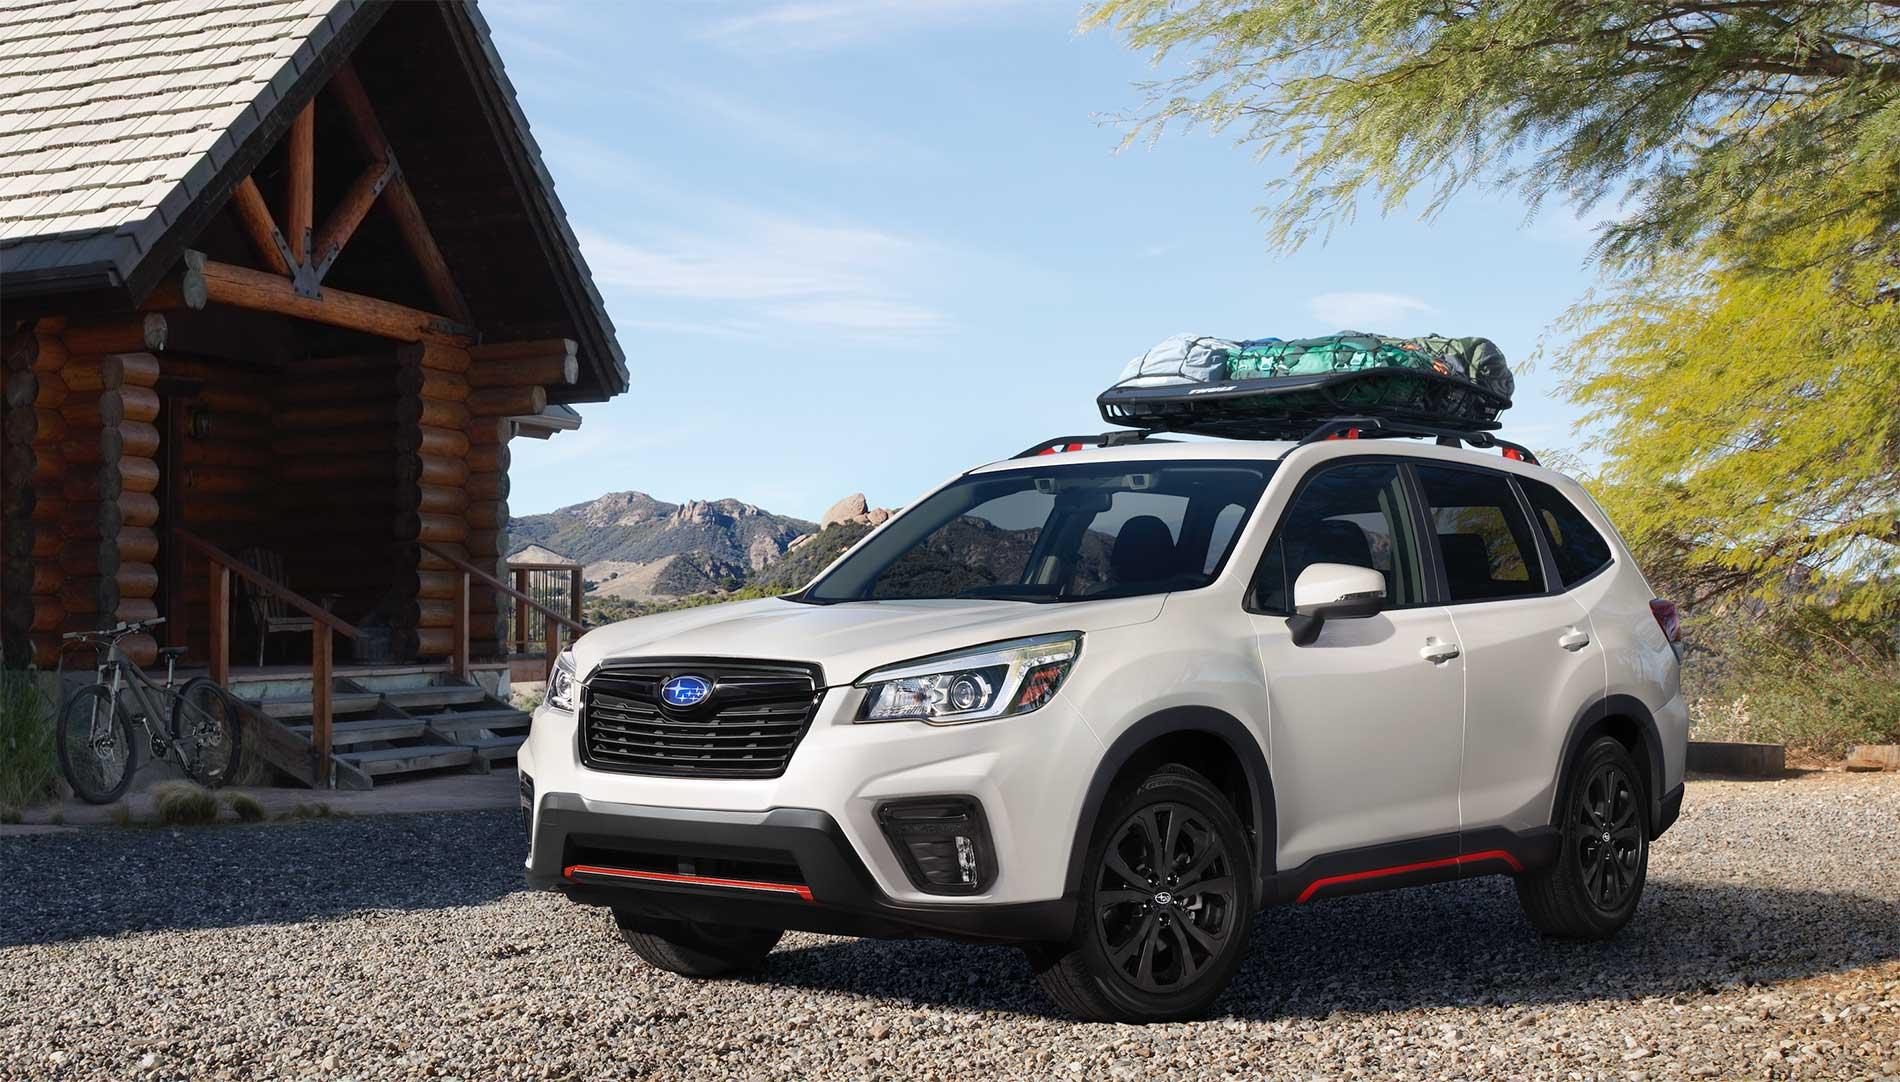 Client: Subaru Photographer: Anthony Dias  Advertising Agency: Designory  Location: Lake Hemet, Ca